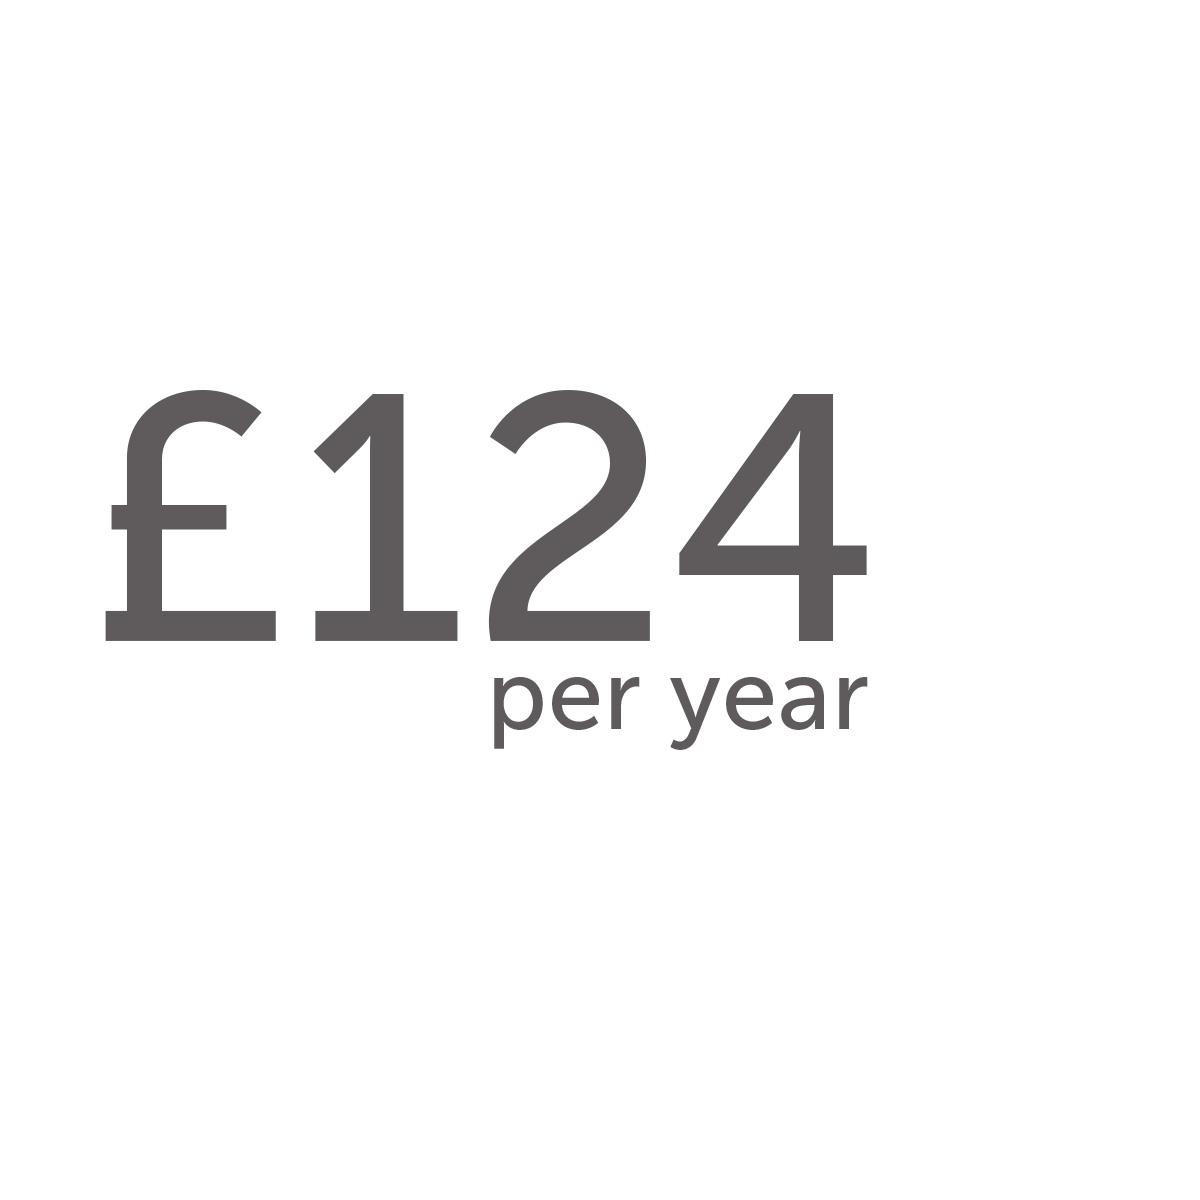 £124 per year